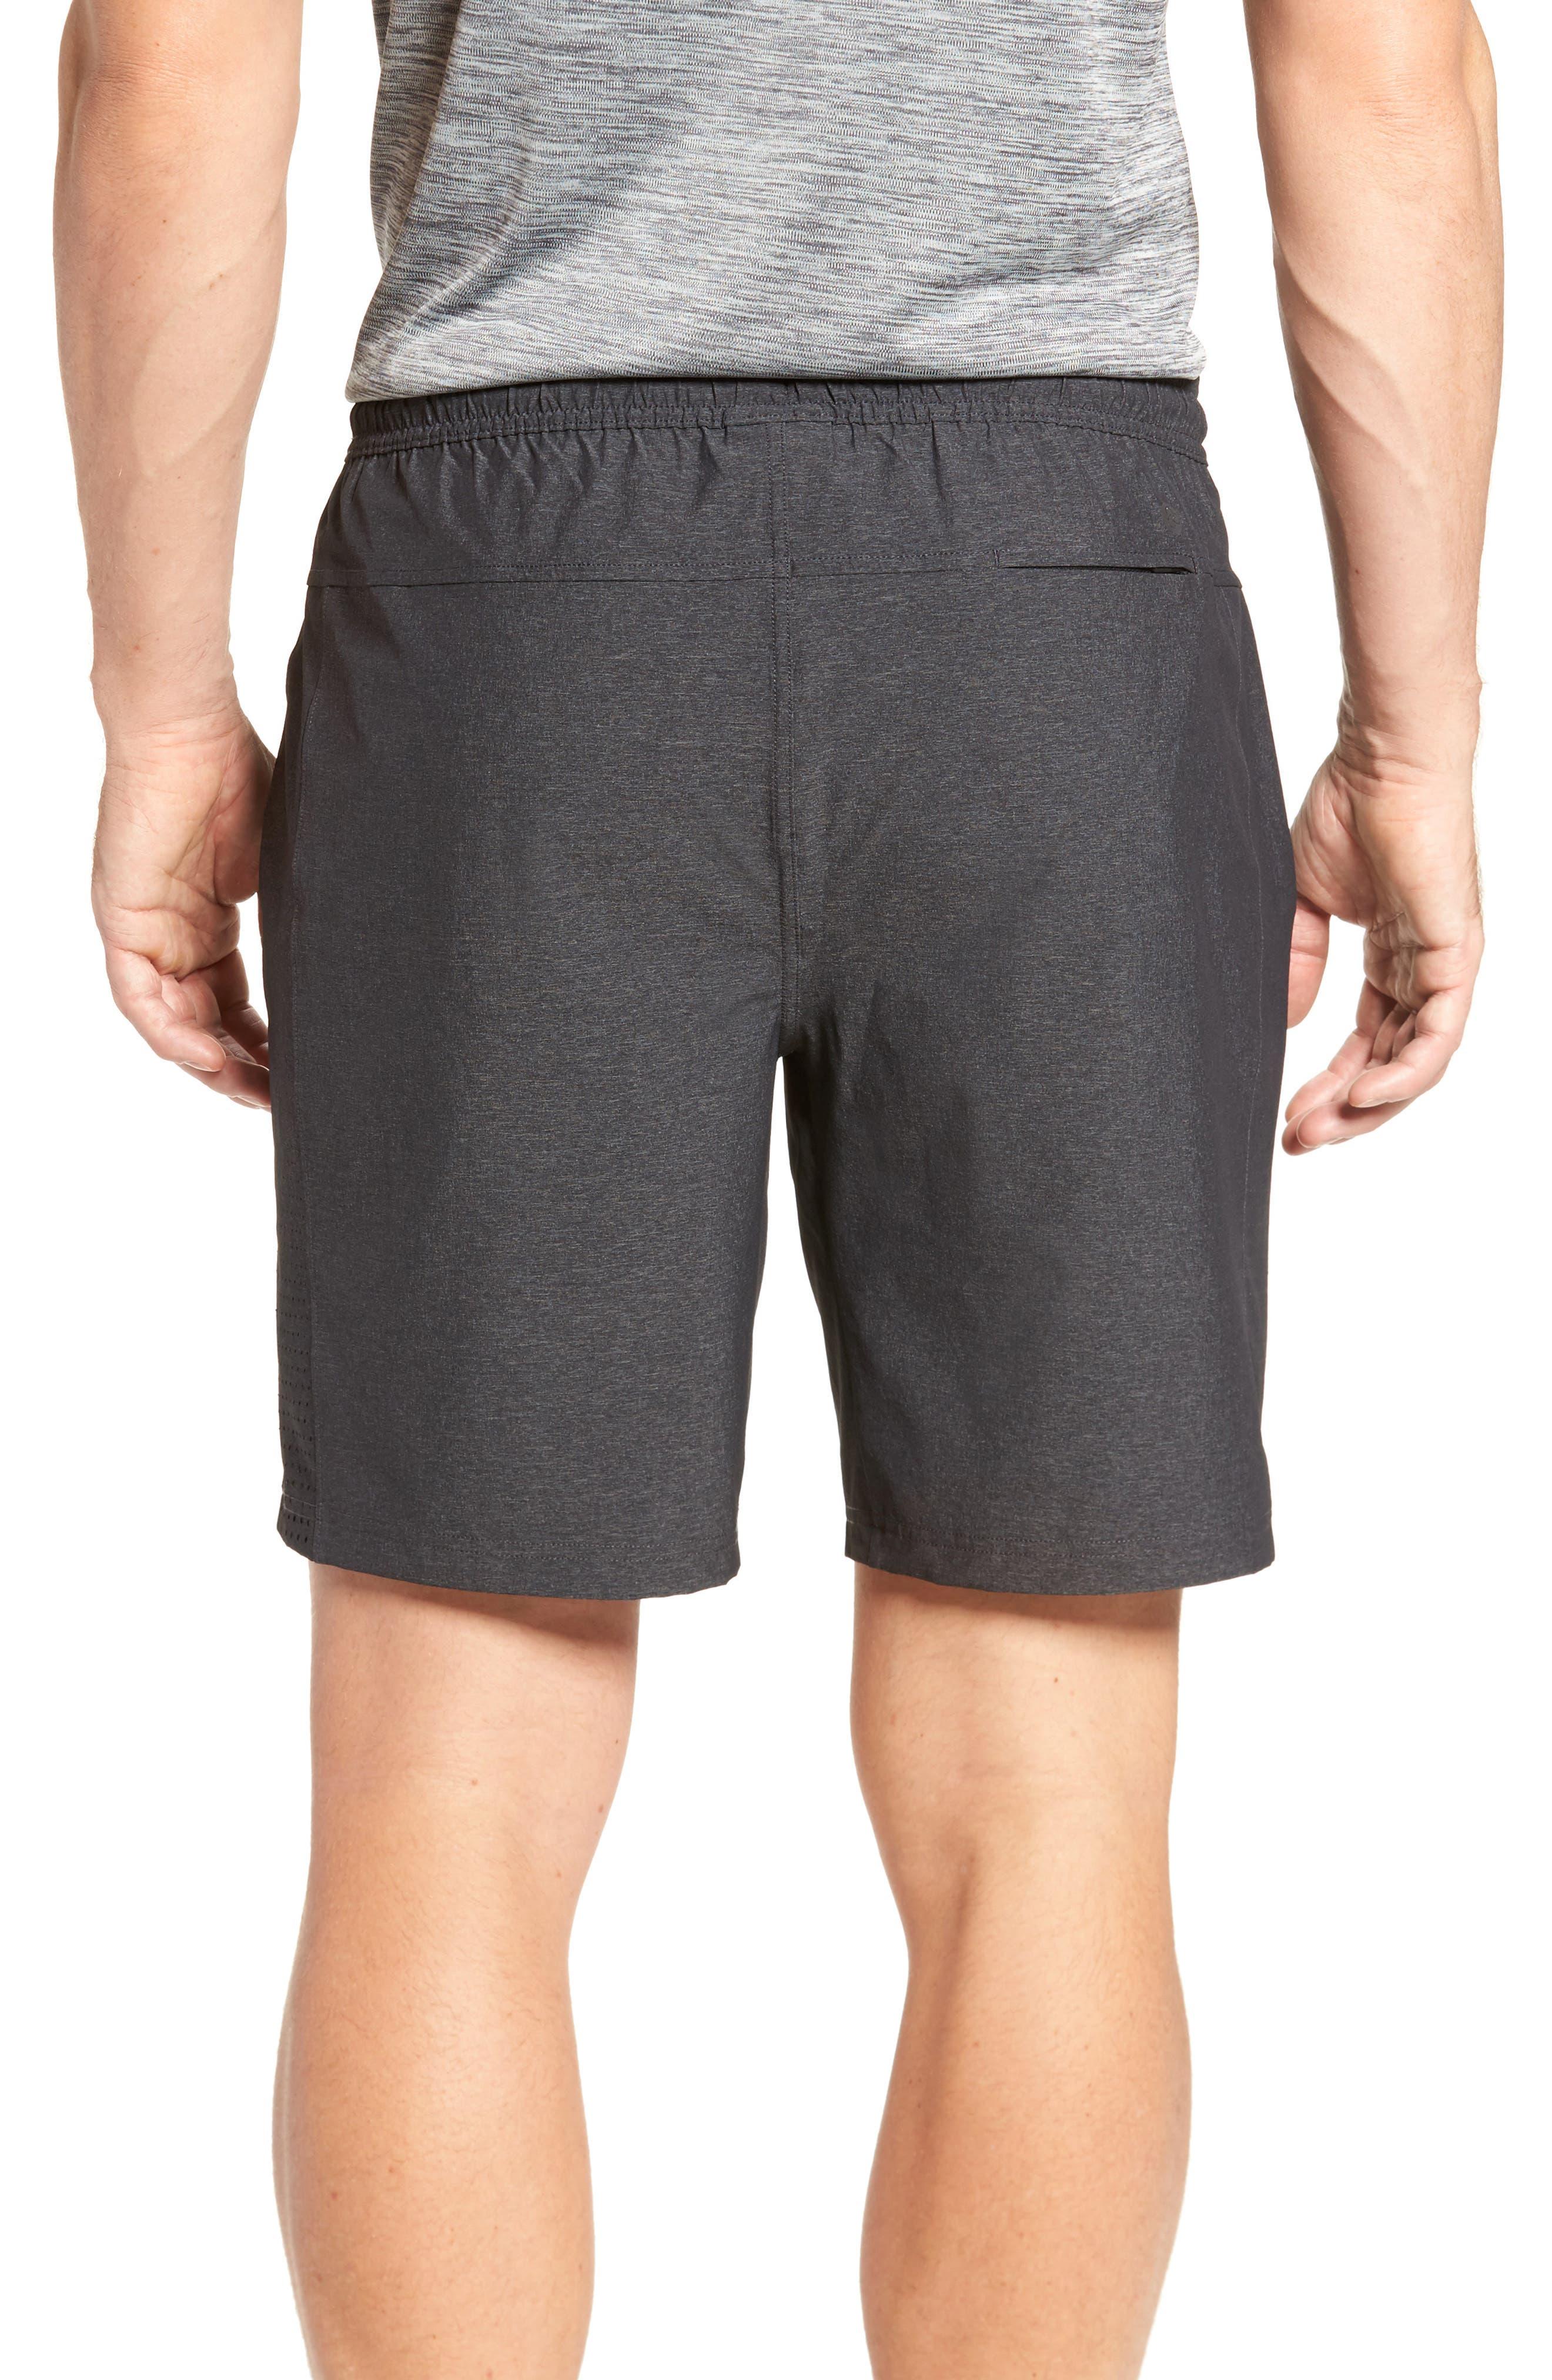 Graphite Shorts,                             Alternate thumbnail 2, color,